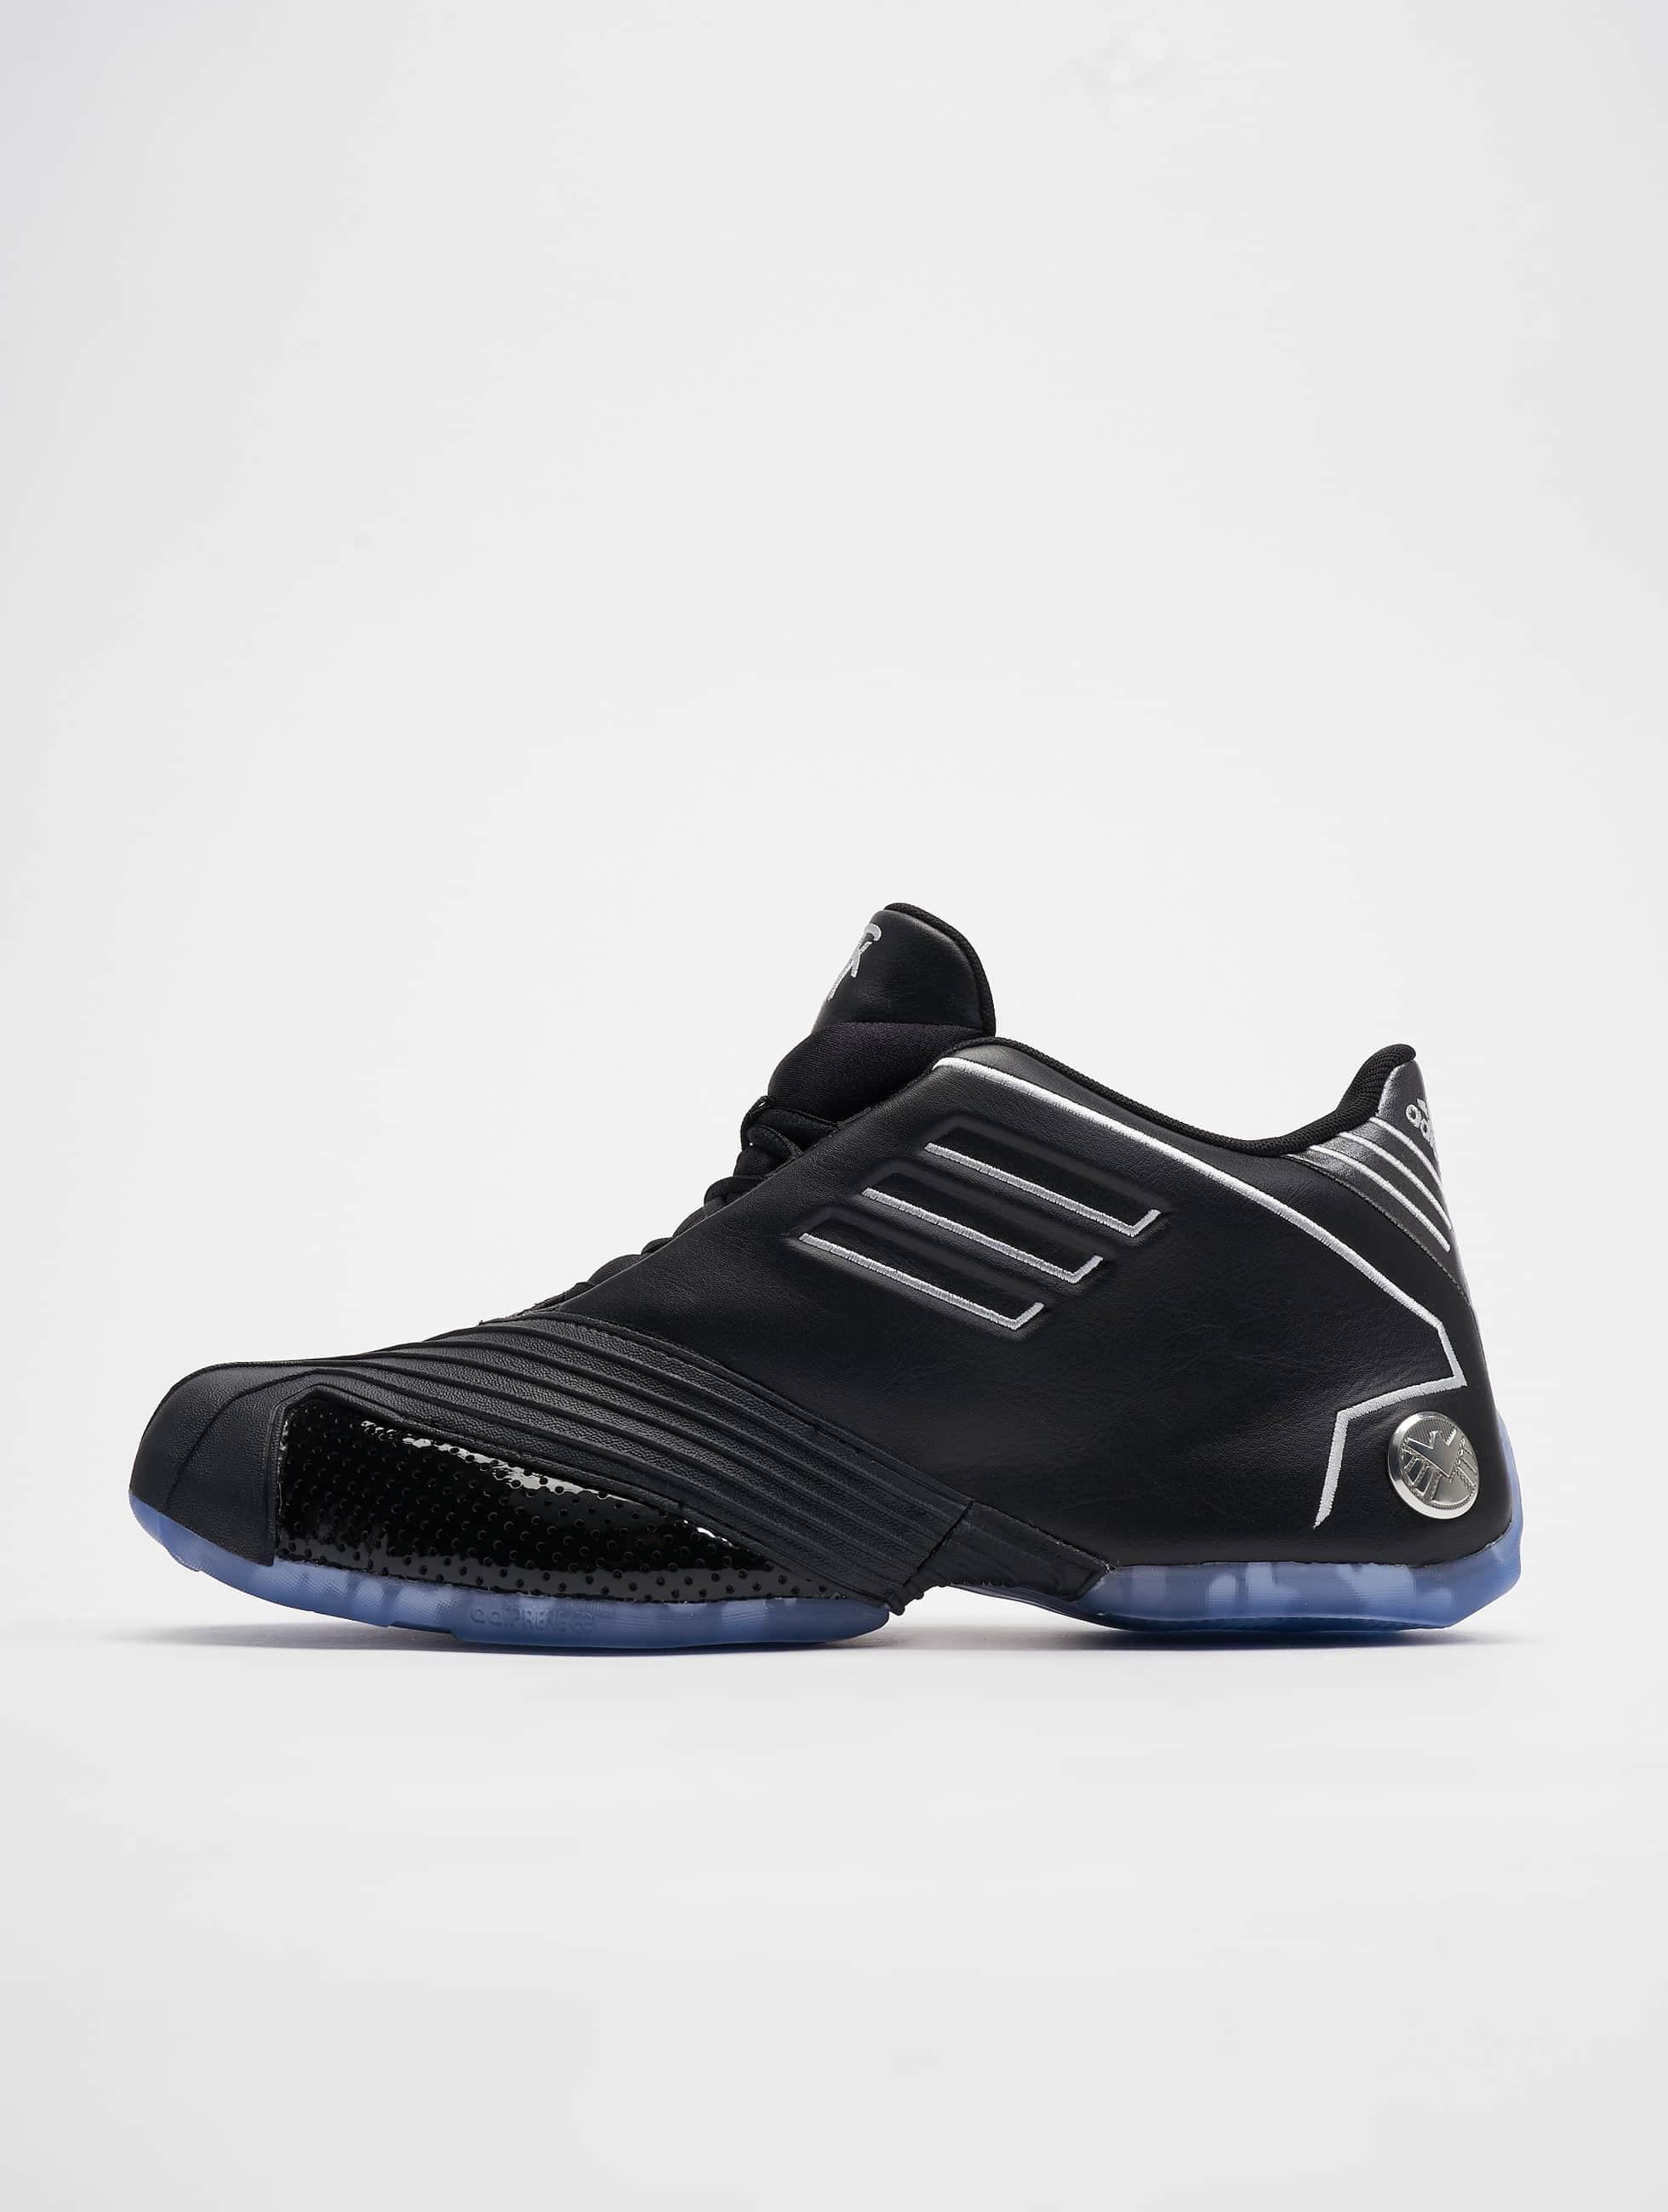 Adidas Shoes Metnight Blacksilvern 1 Basketball Met Core Tmac y6gbfY7